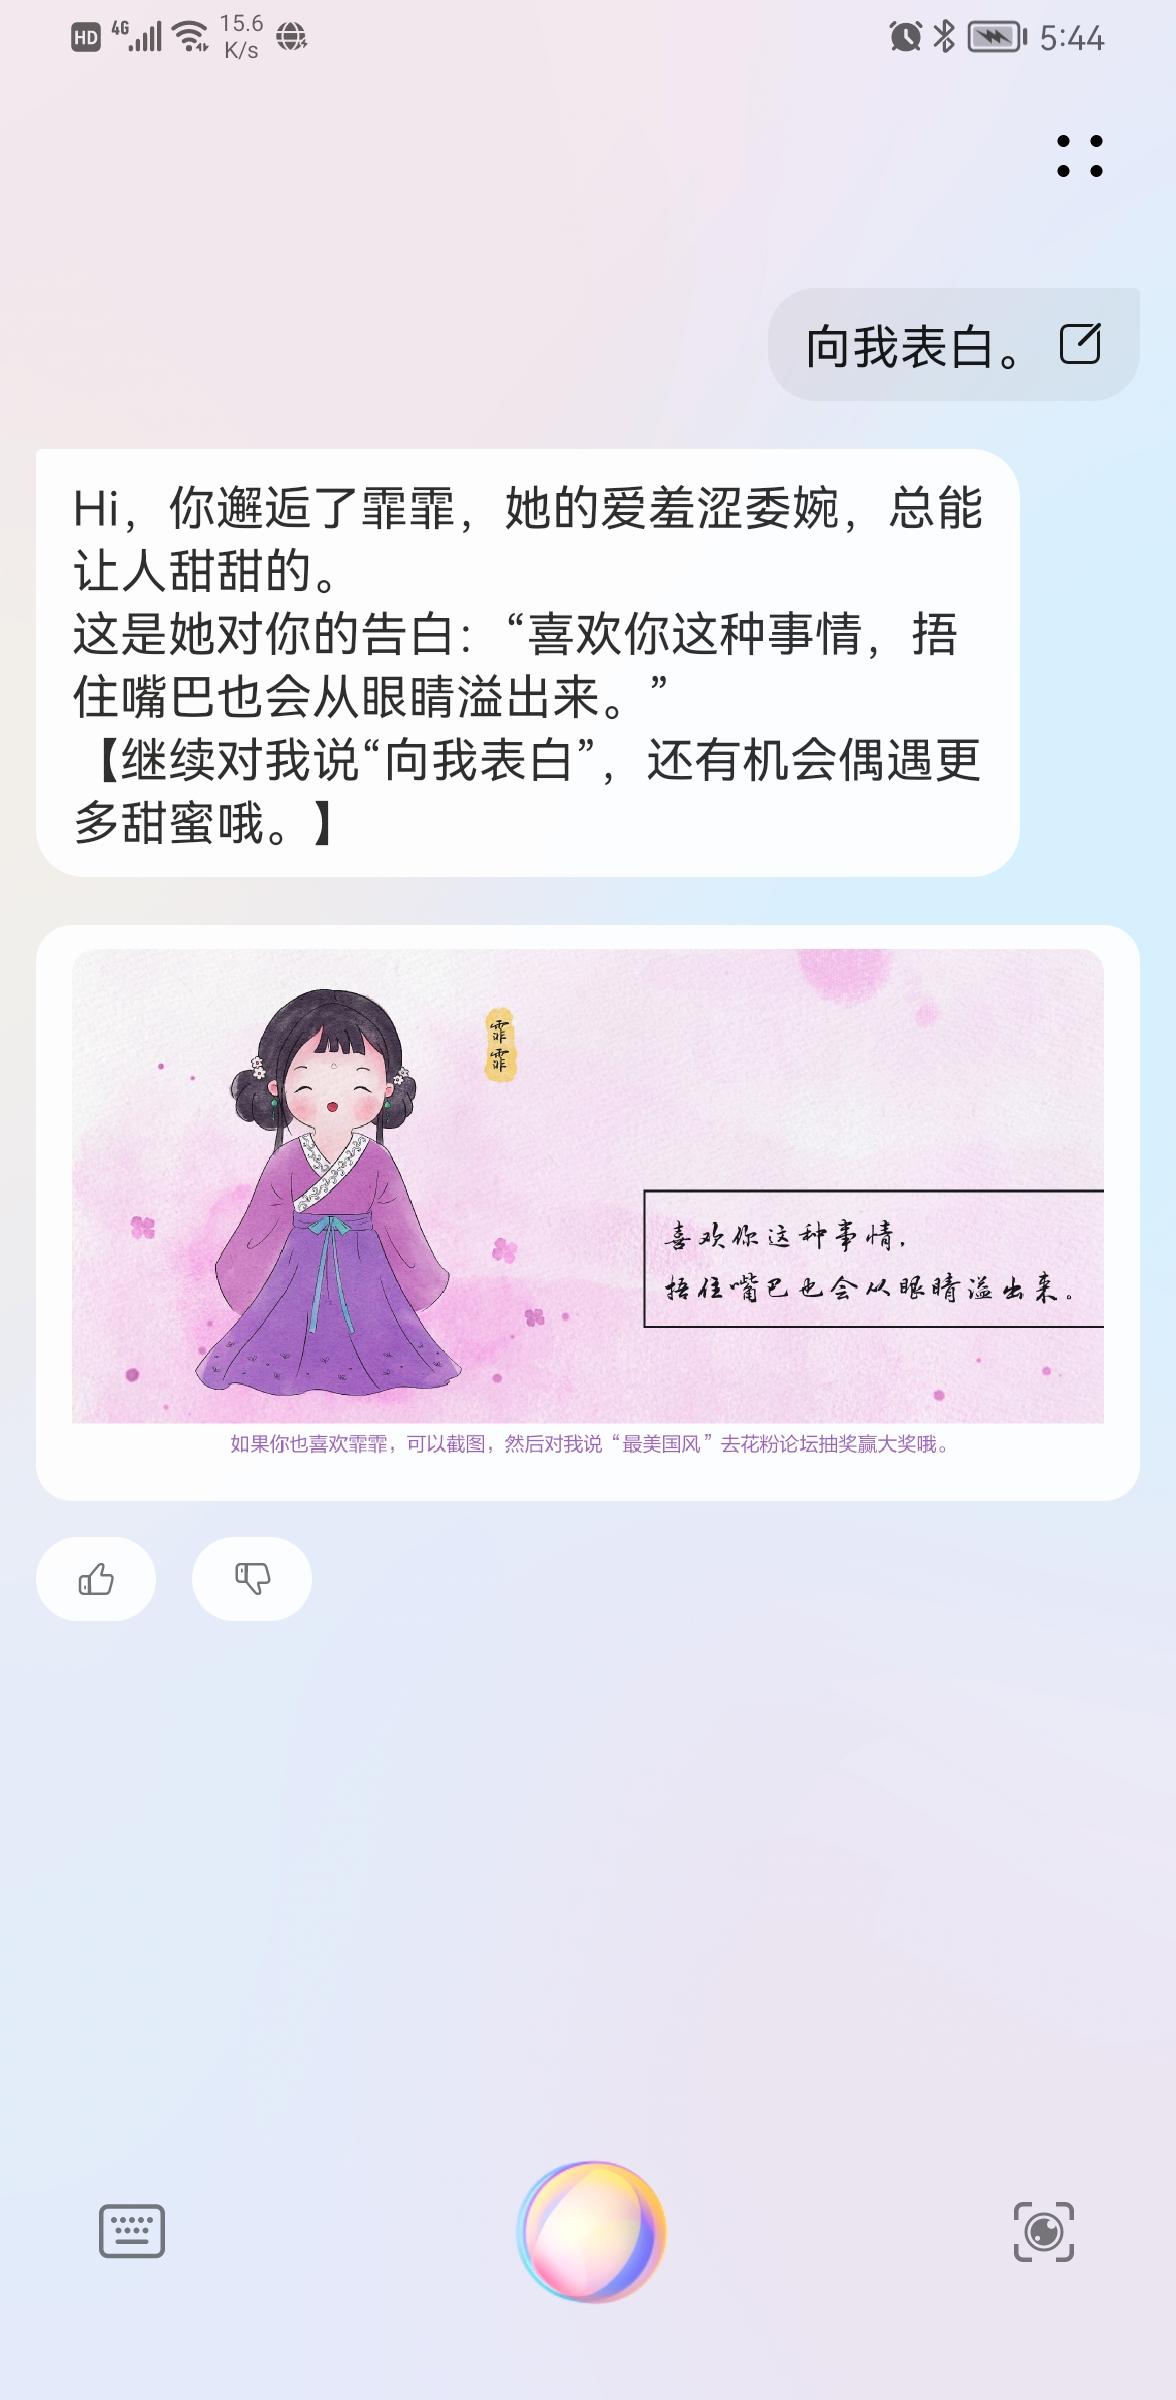 Screenshot_20210611_174452_com.huawei.vassistant.jpg